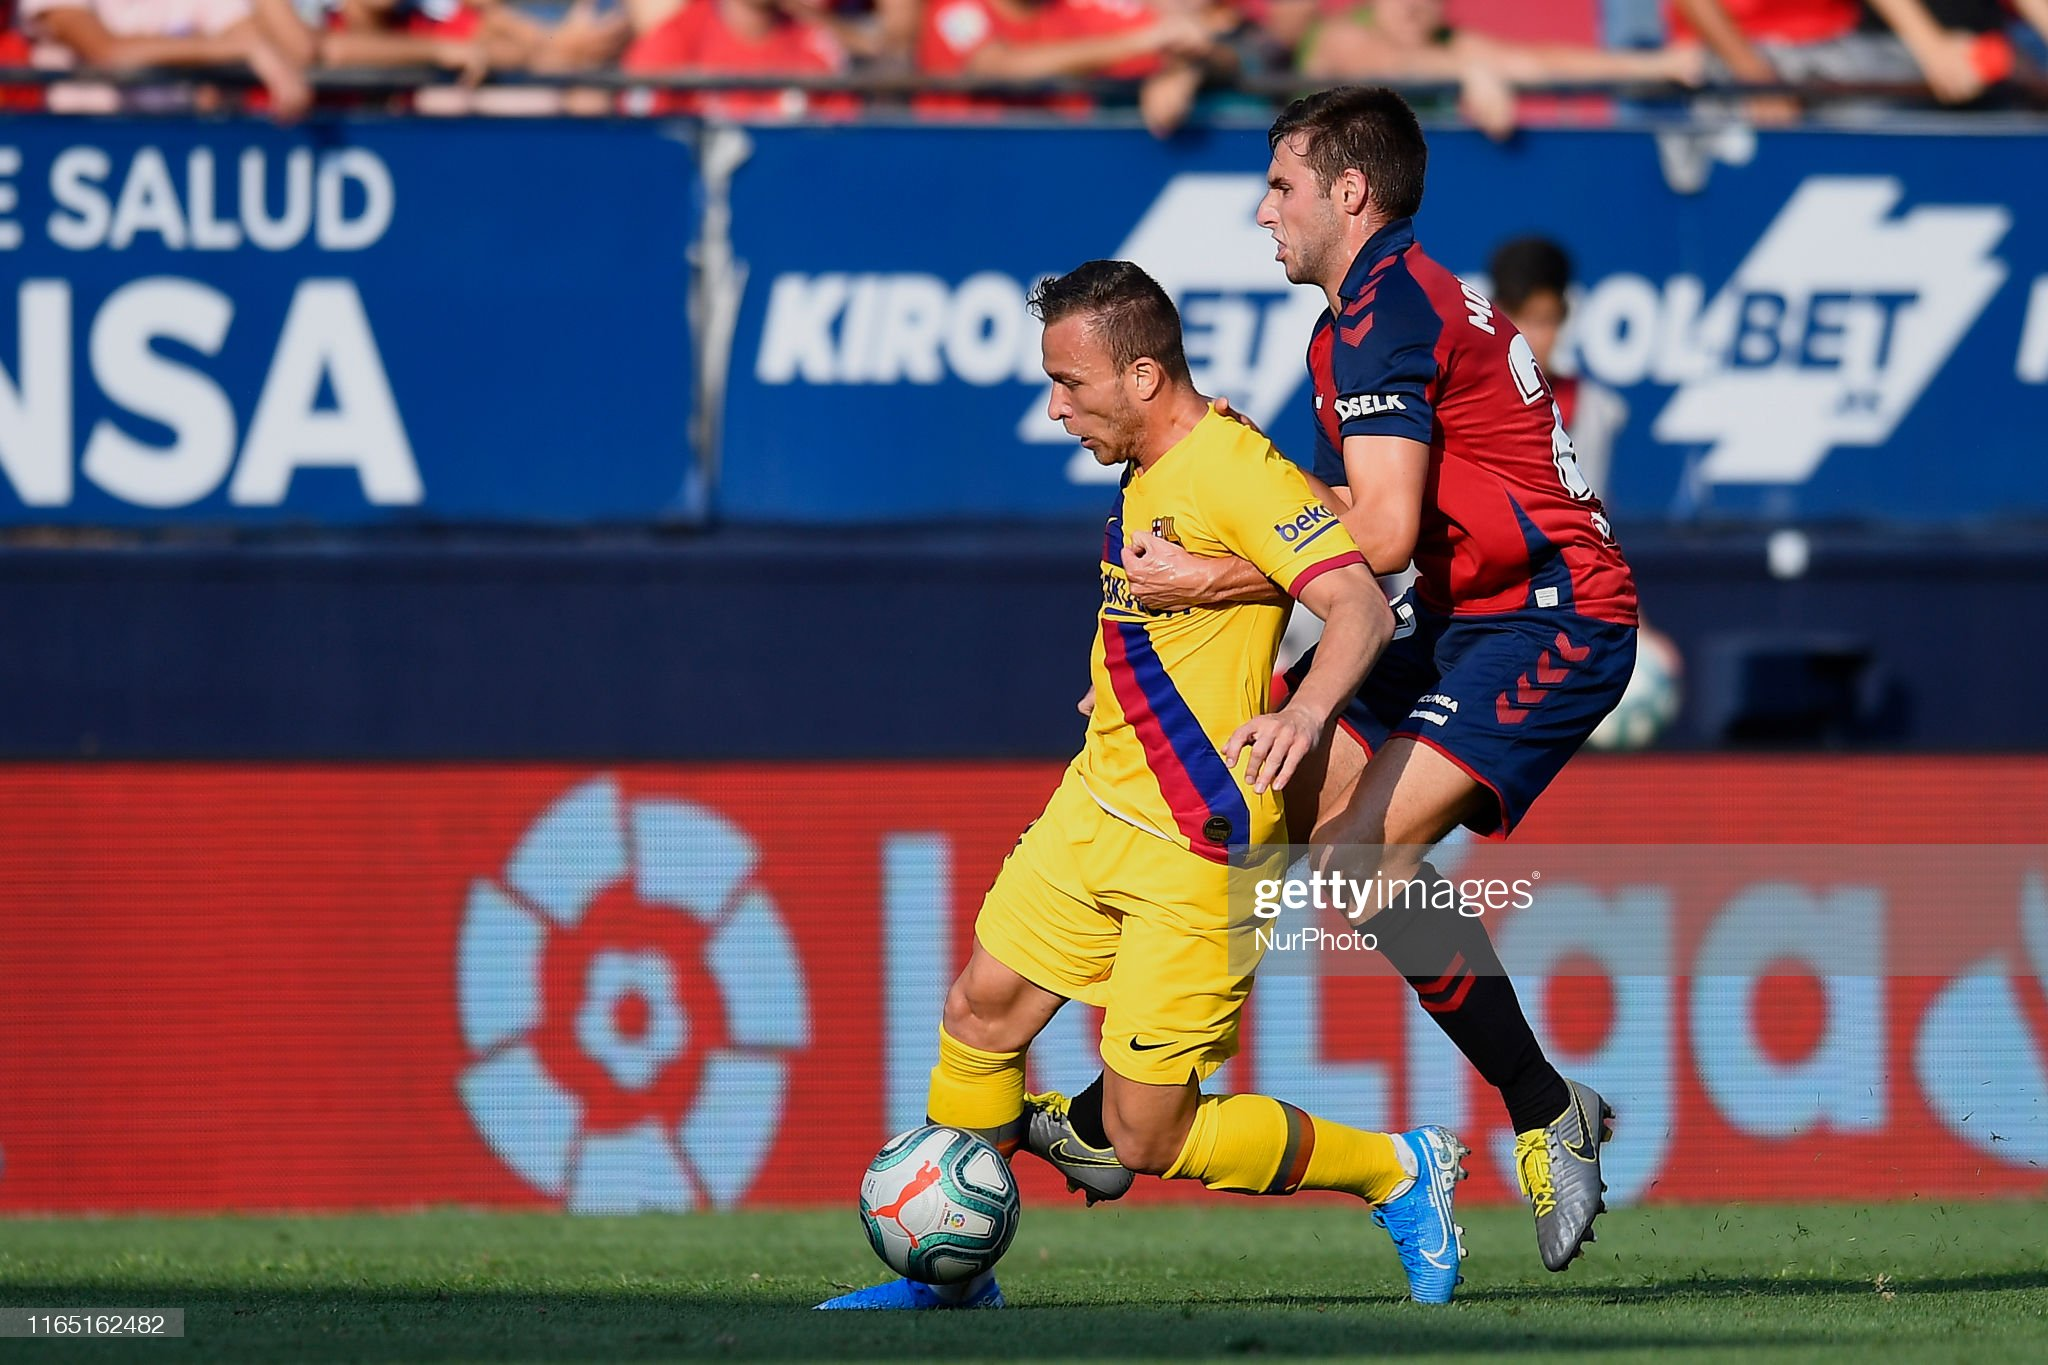 صور مباراة : أوساسونا - برشلونة 2-2 ( 31-08-2019 )  Arthur-melo-of-barcelona-and-jon-moncayola-of-osasuna-competes-for-picture-id1165162482?s=2048x2048